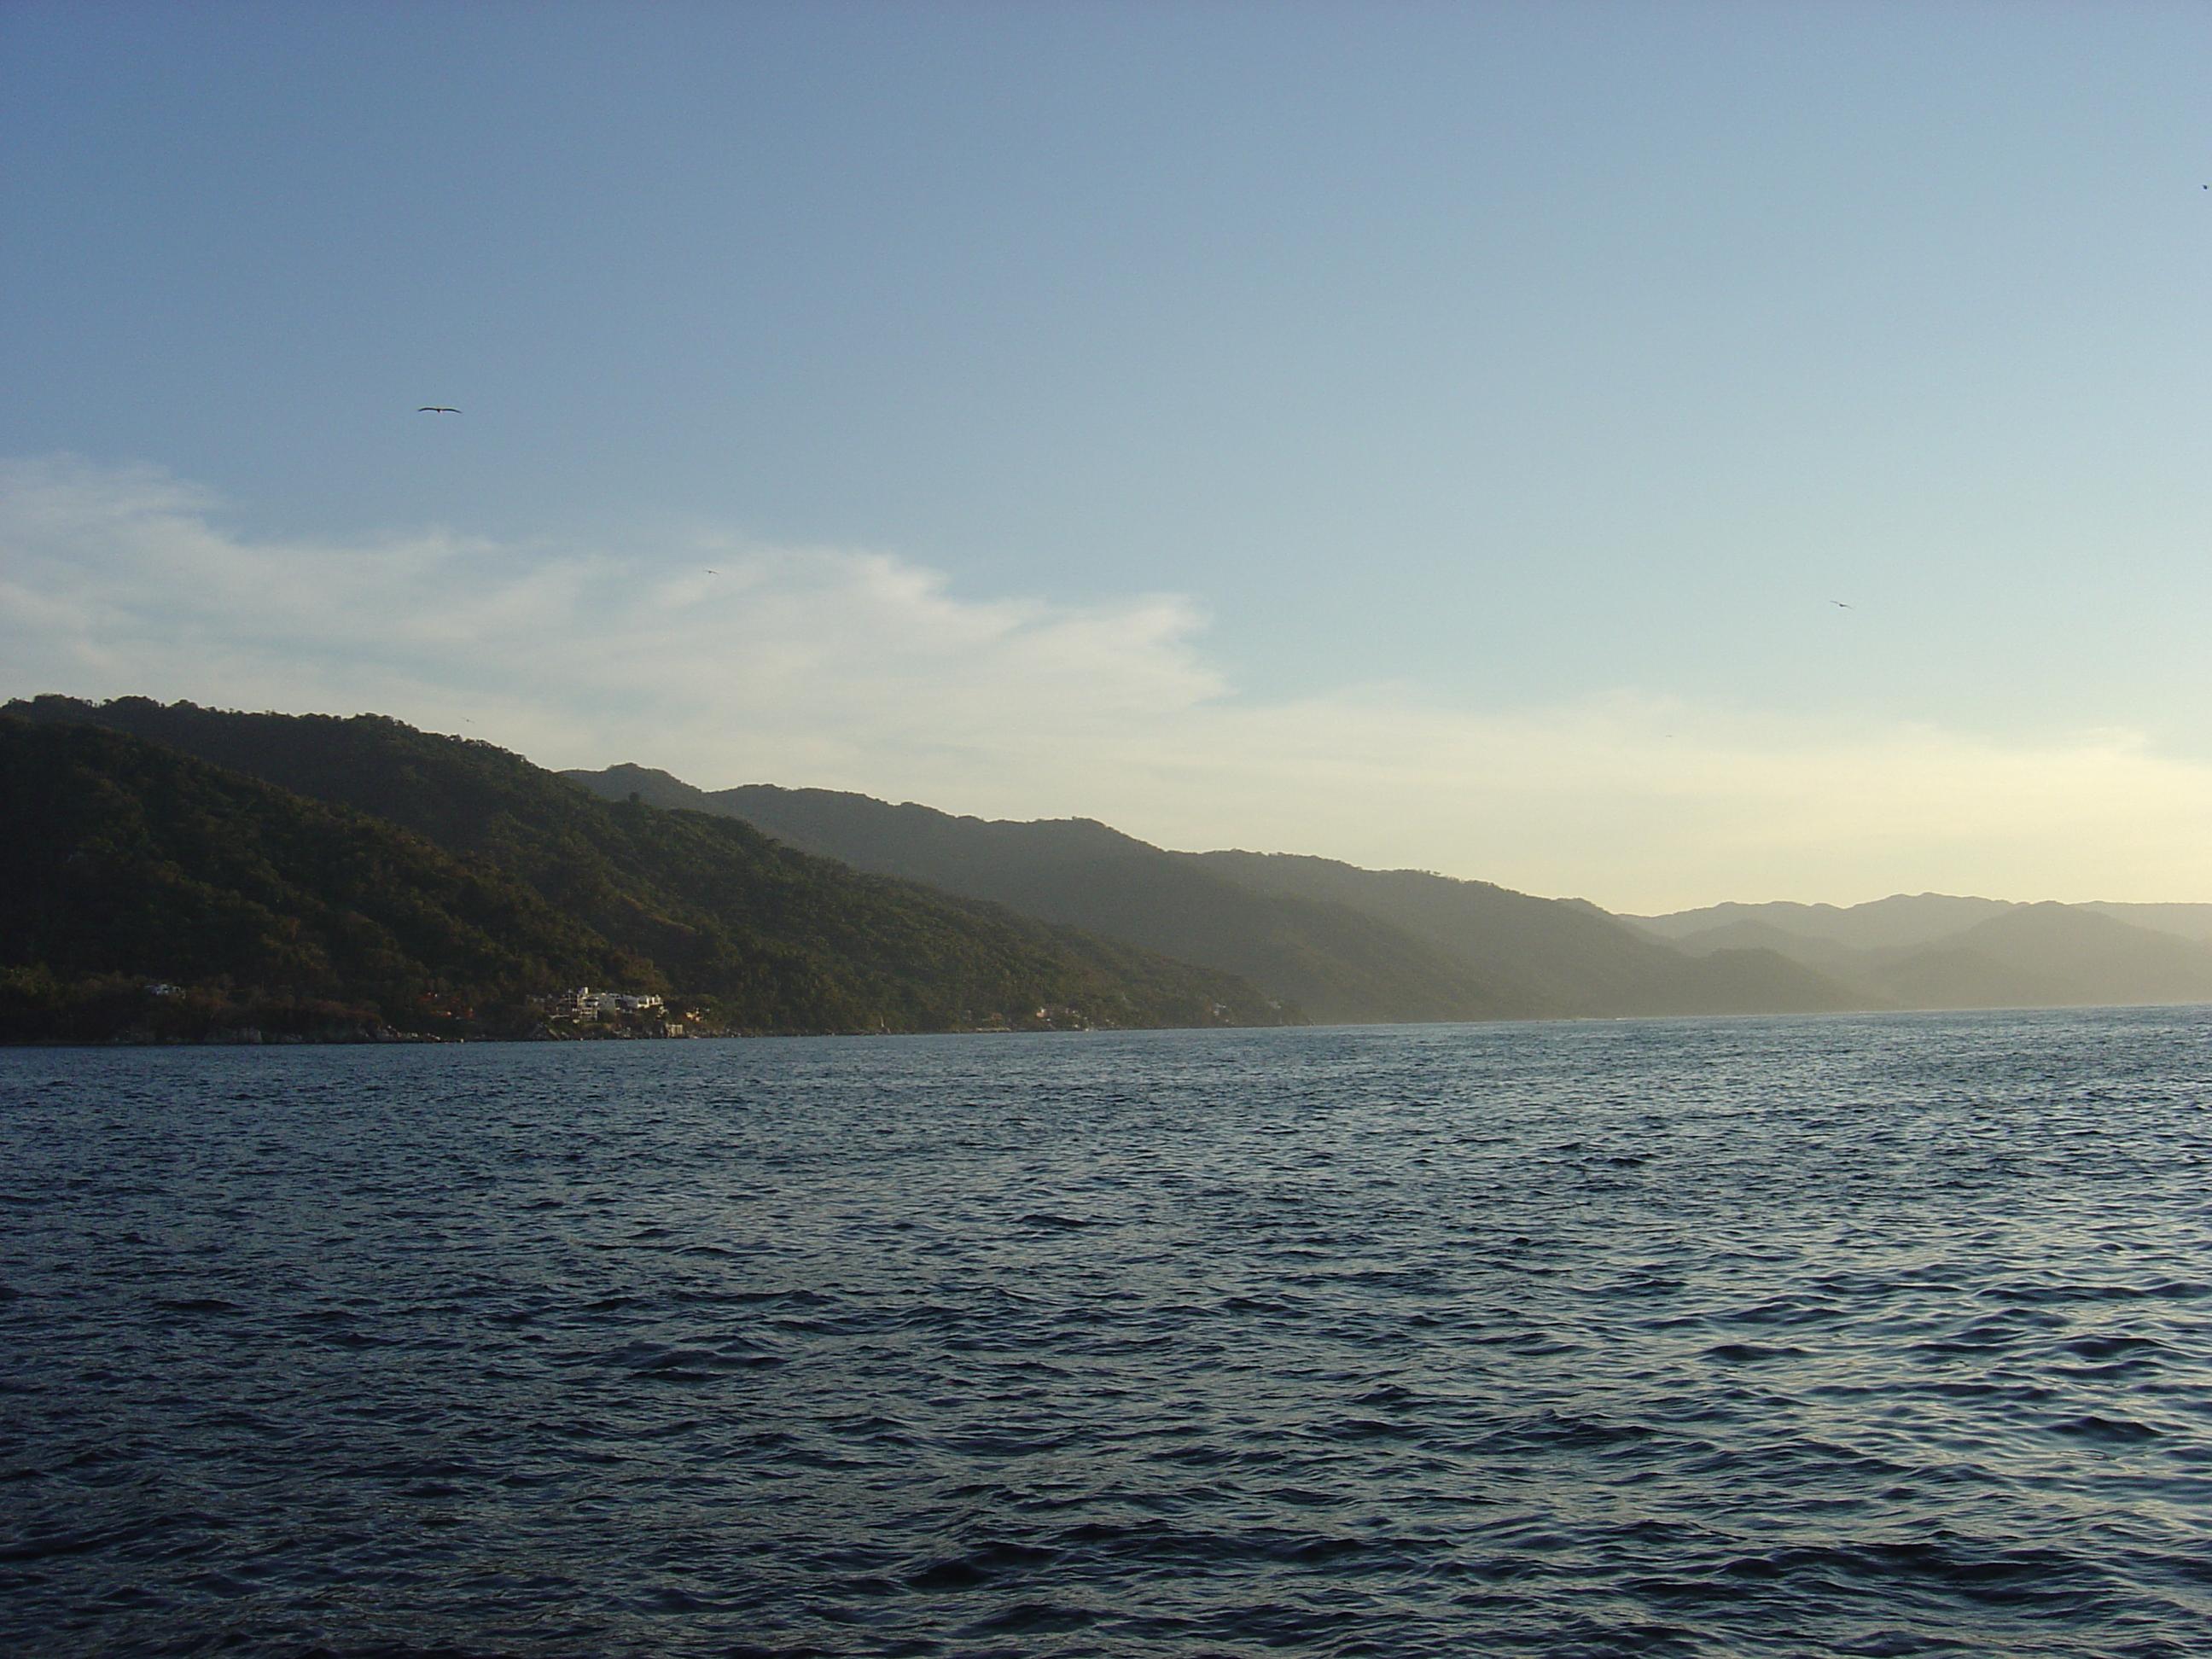 The beautiful shoreline